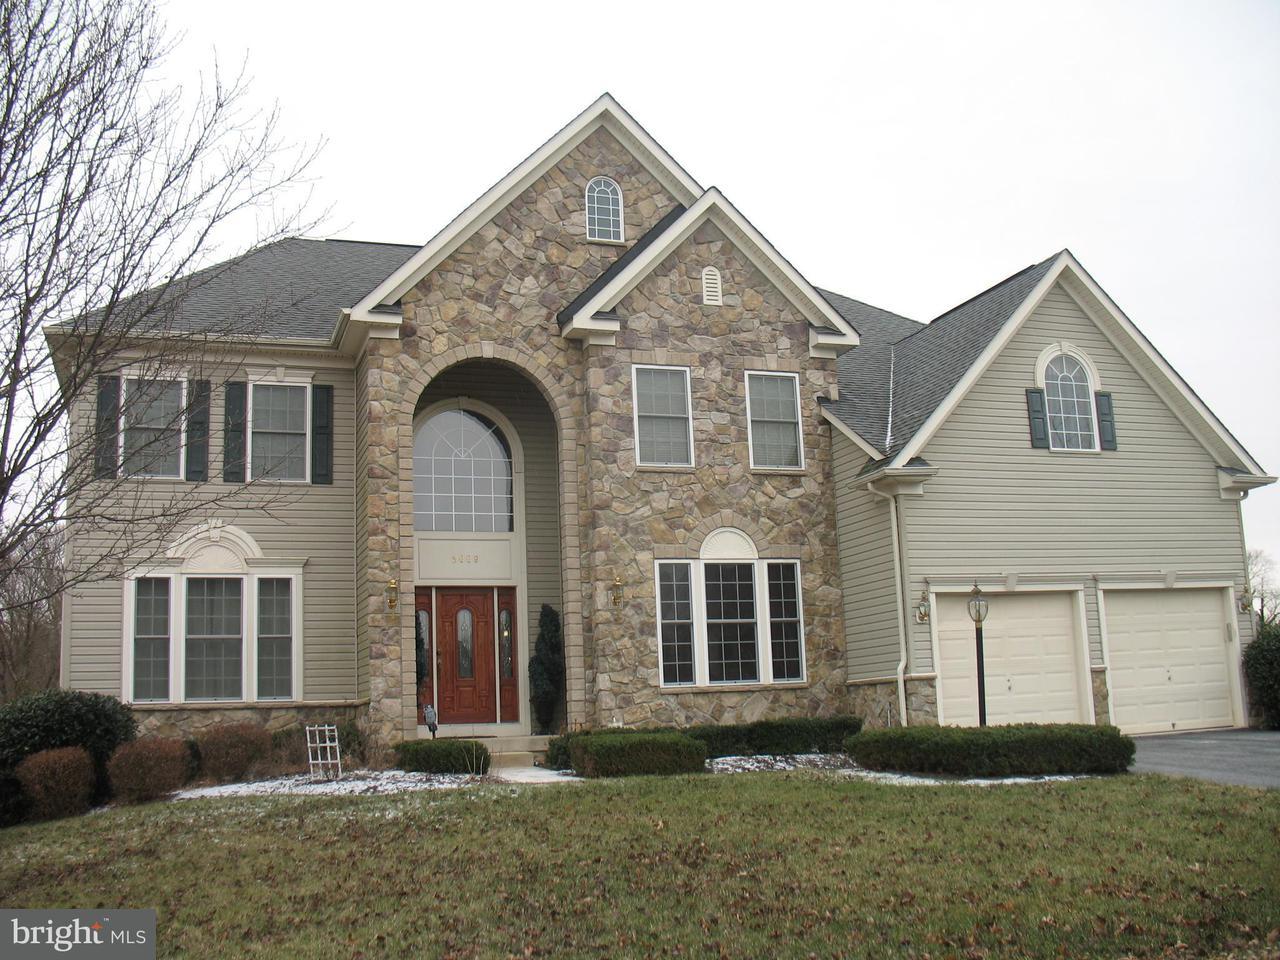 Single Family Home for Sale at 8009 Pink Azalea Court 8009 Pink Azalea Court Windsor Mill, Maryland 21244 United States